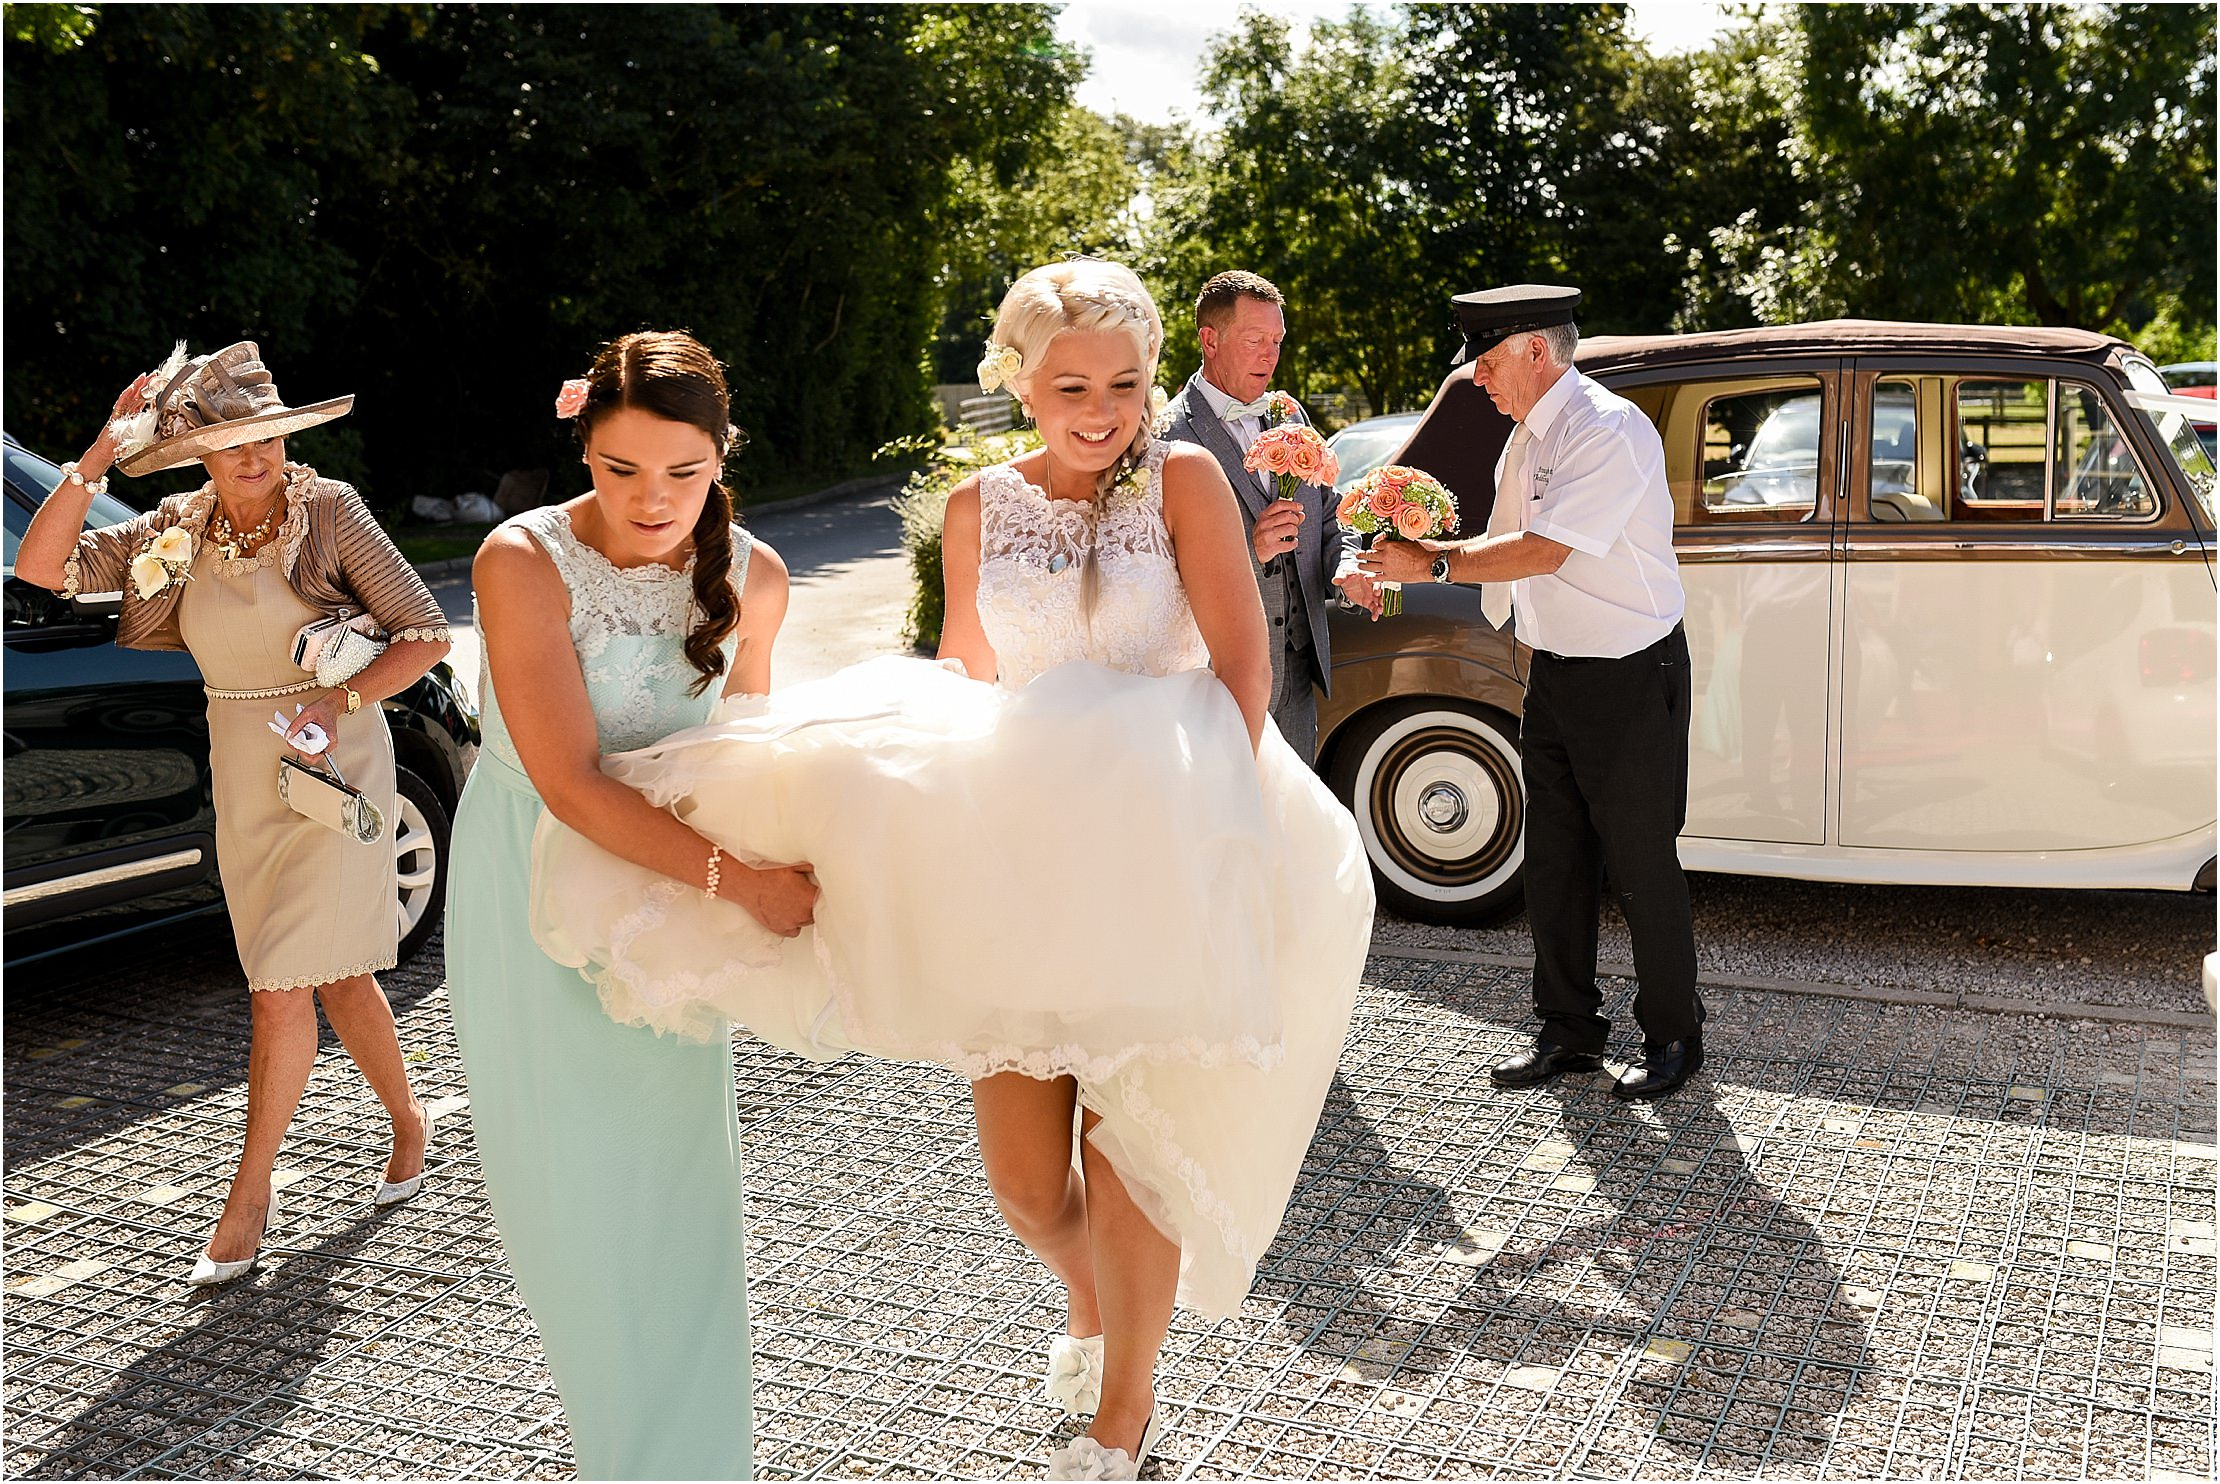 the-villa-wrea-green-summer-wedding-29.jpg